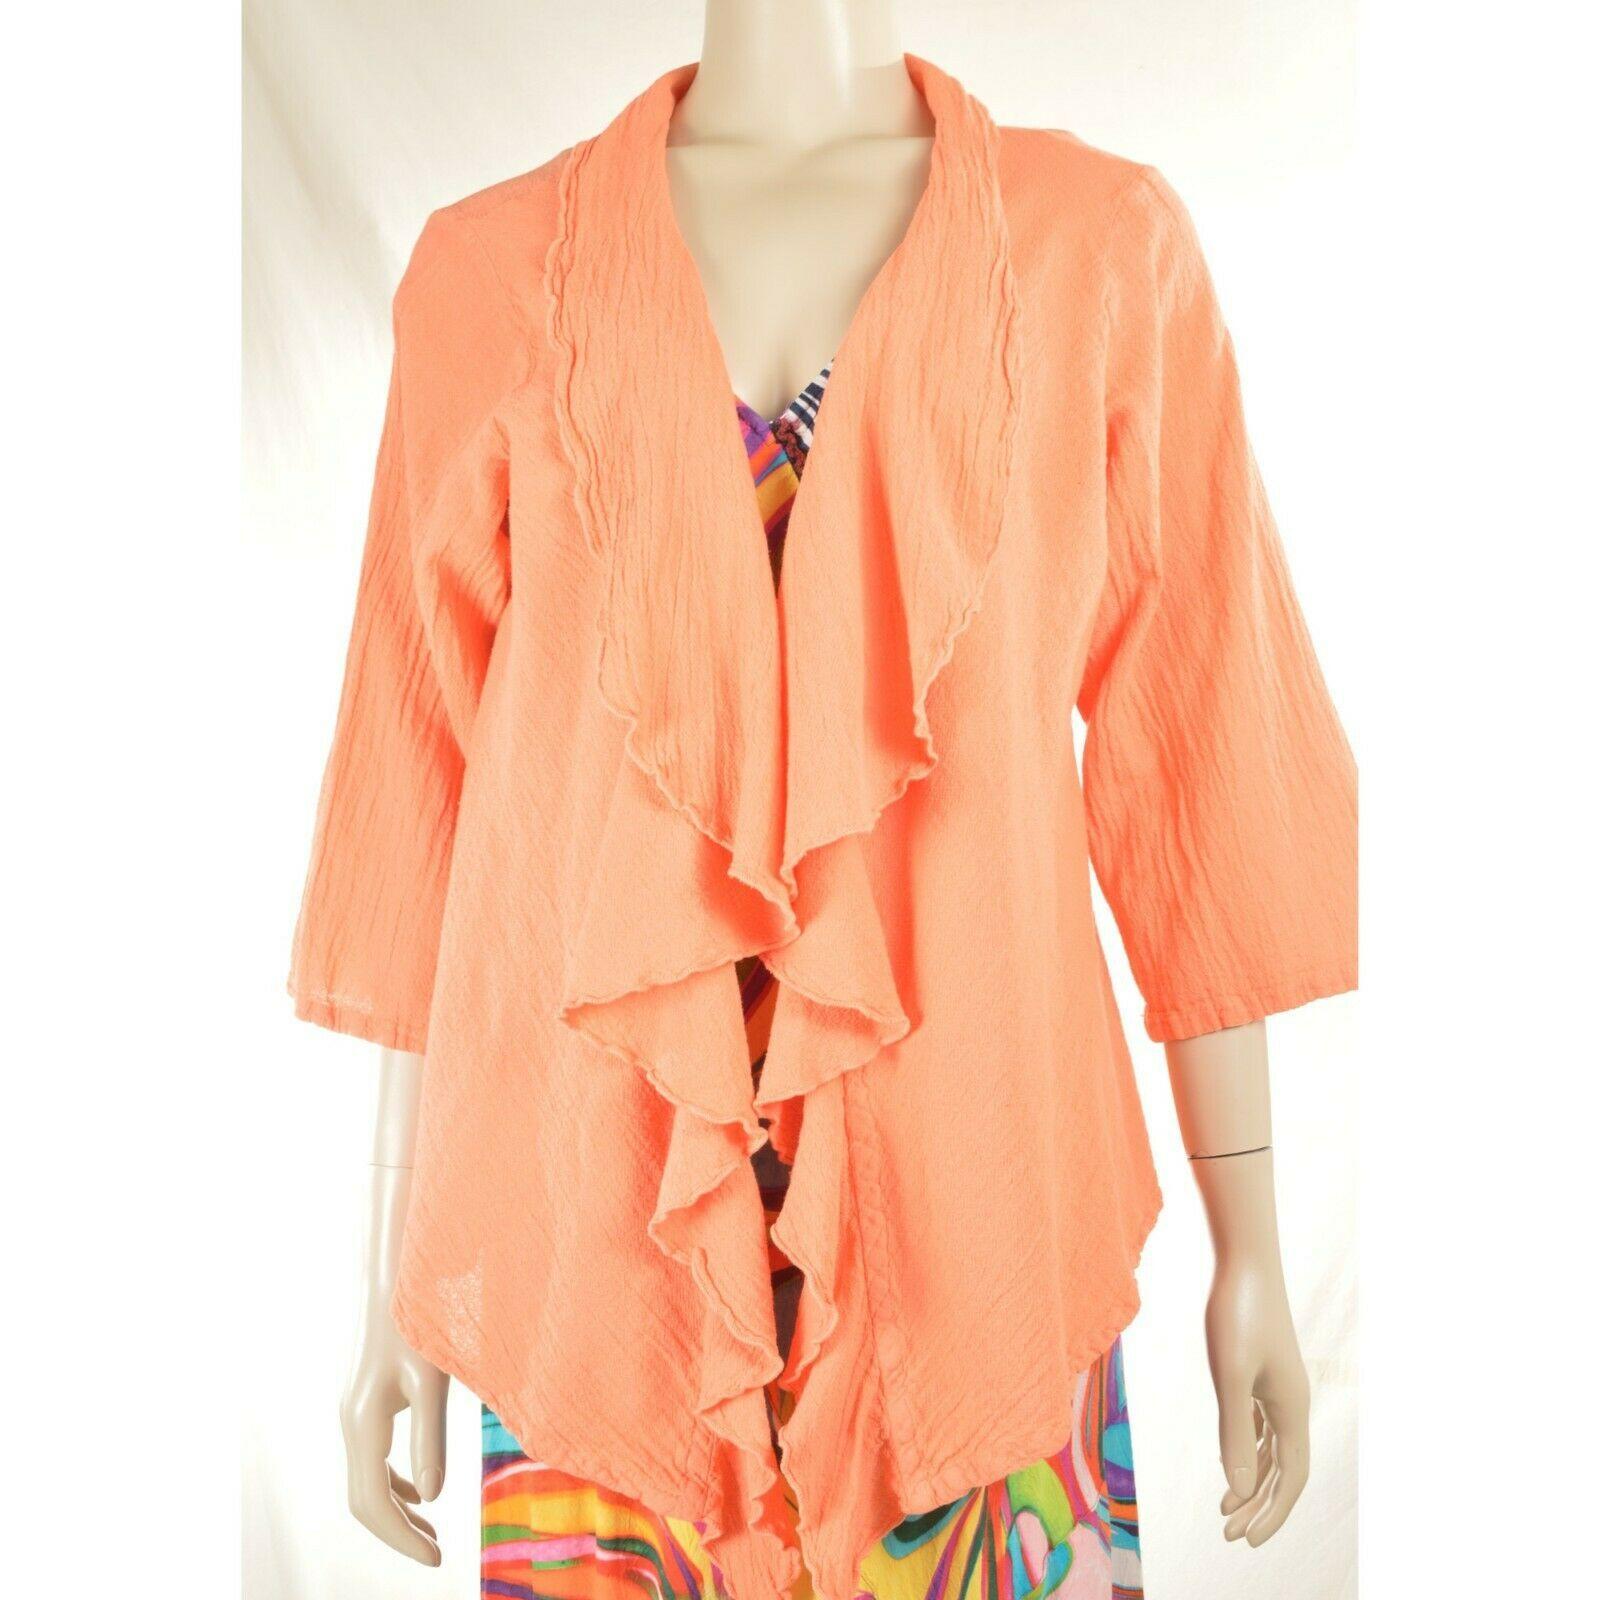 Oh My Gauge jacket cover open OS orange sherbet long sleeve ruffle front hi lo